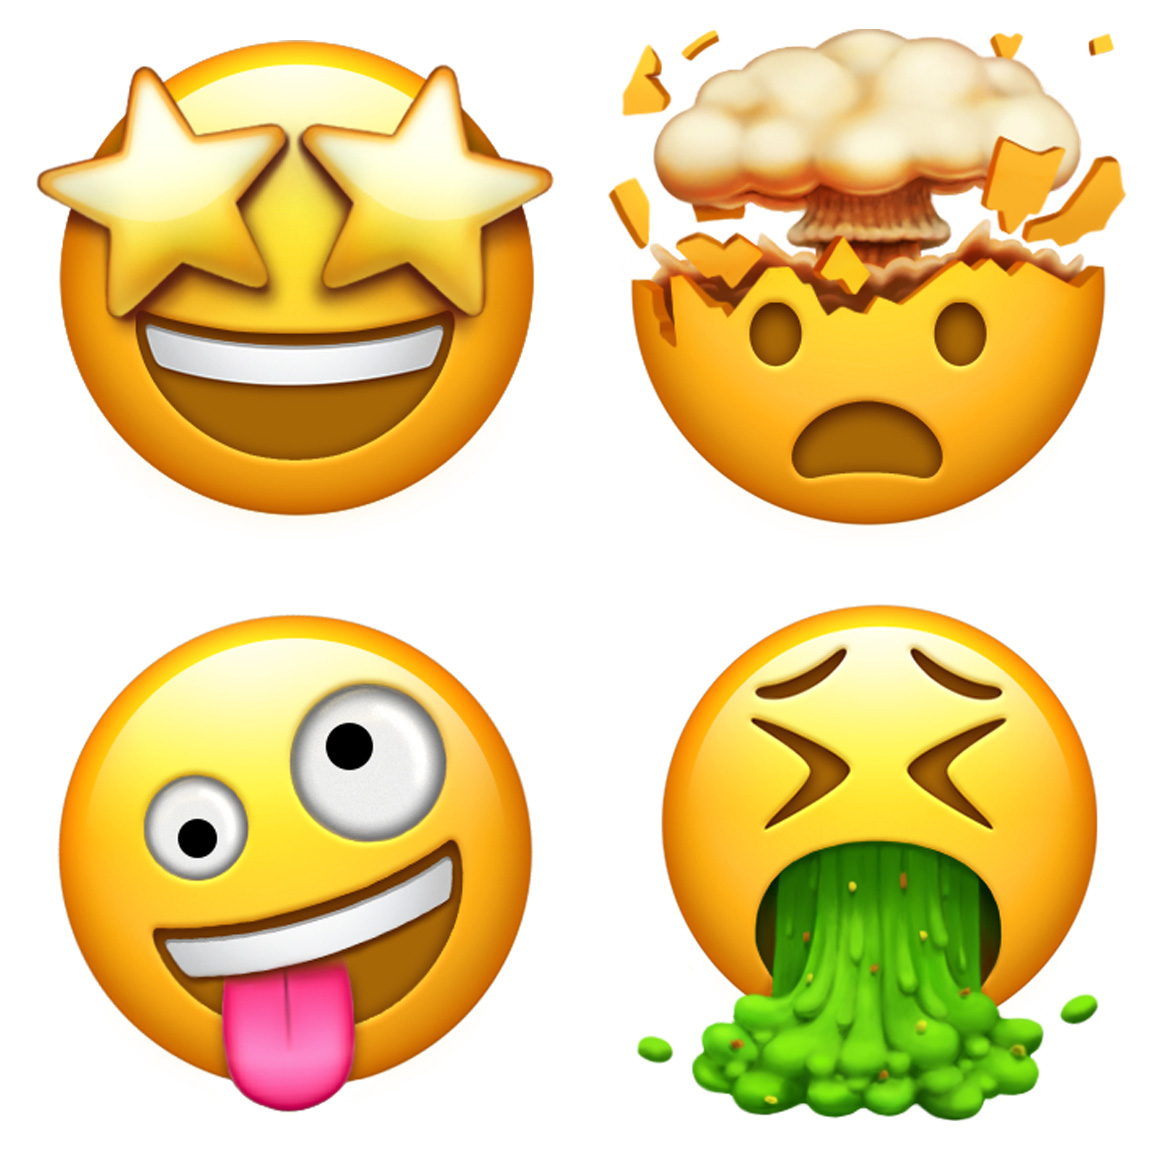 new-emoji-update-creative-pub-marketing-5